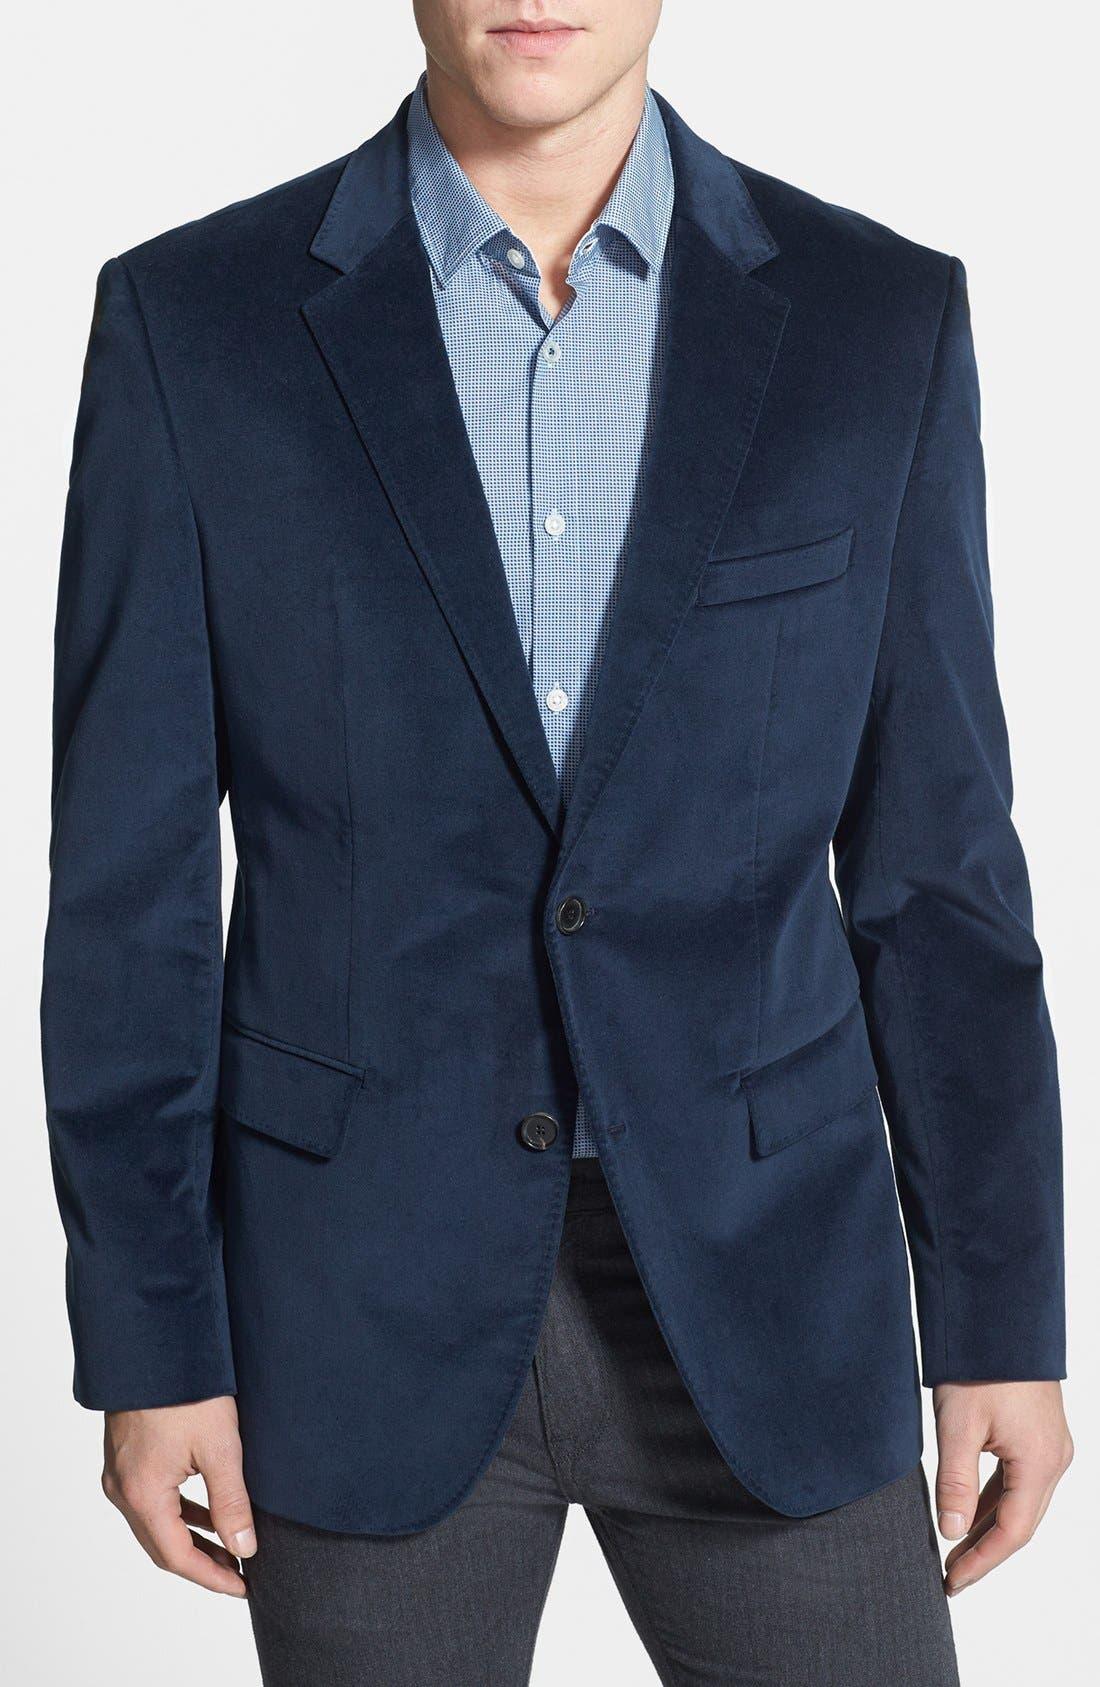 Alternate Image 1 Selected - BOSS HUGO BOSS 'The Coast Us' Stretch Cotton Sportcoat